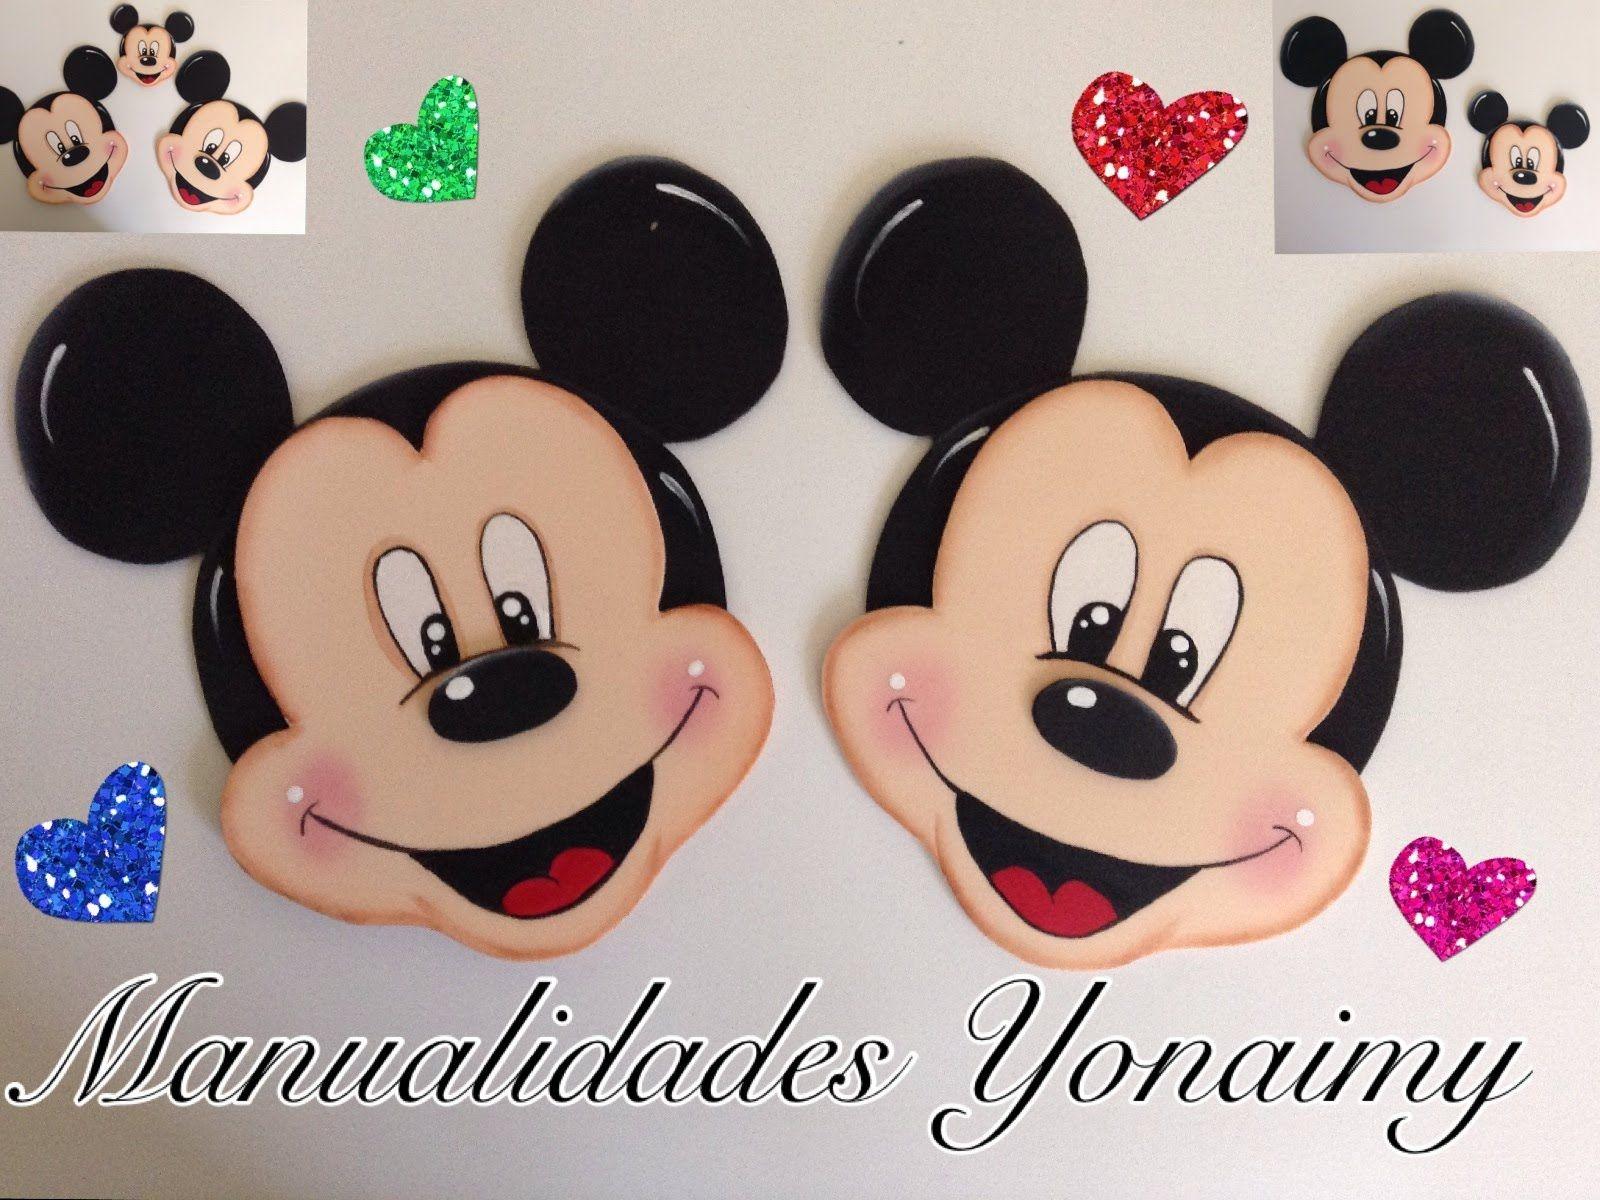 Mickey mouse hecho con foamy o goma eva foam flowers - Manualidades minnie mouse ...